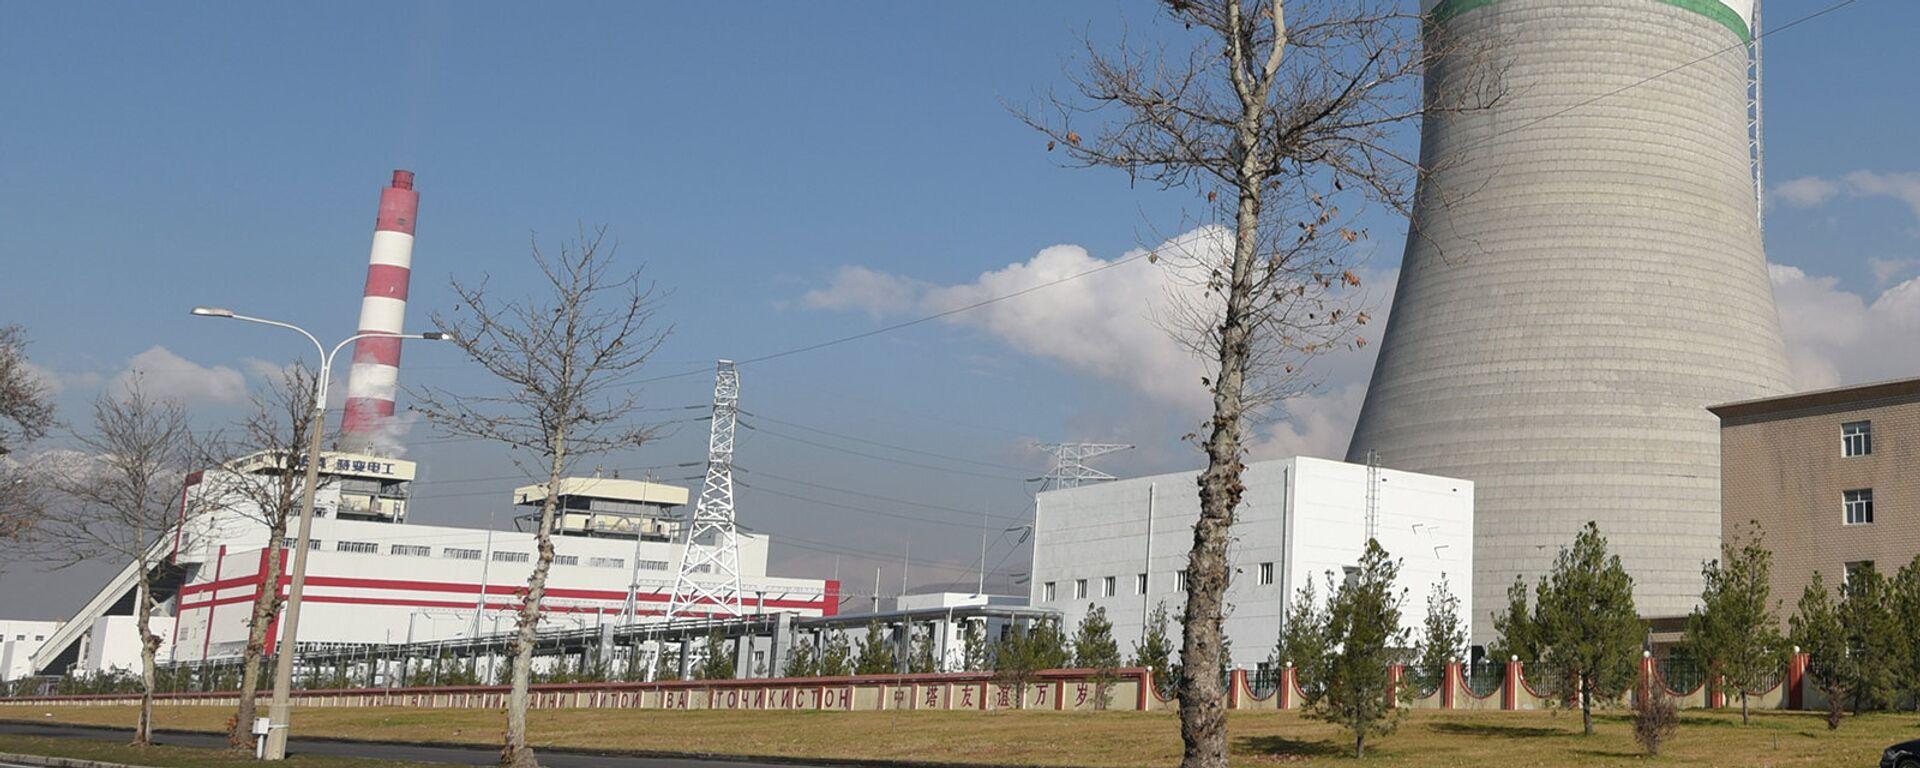 "ТЭЦ ""Душанбе-2"". Архивное фото - Sputnik Таджикистан, 1920, 22.07.2021"